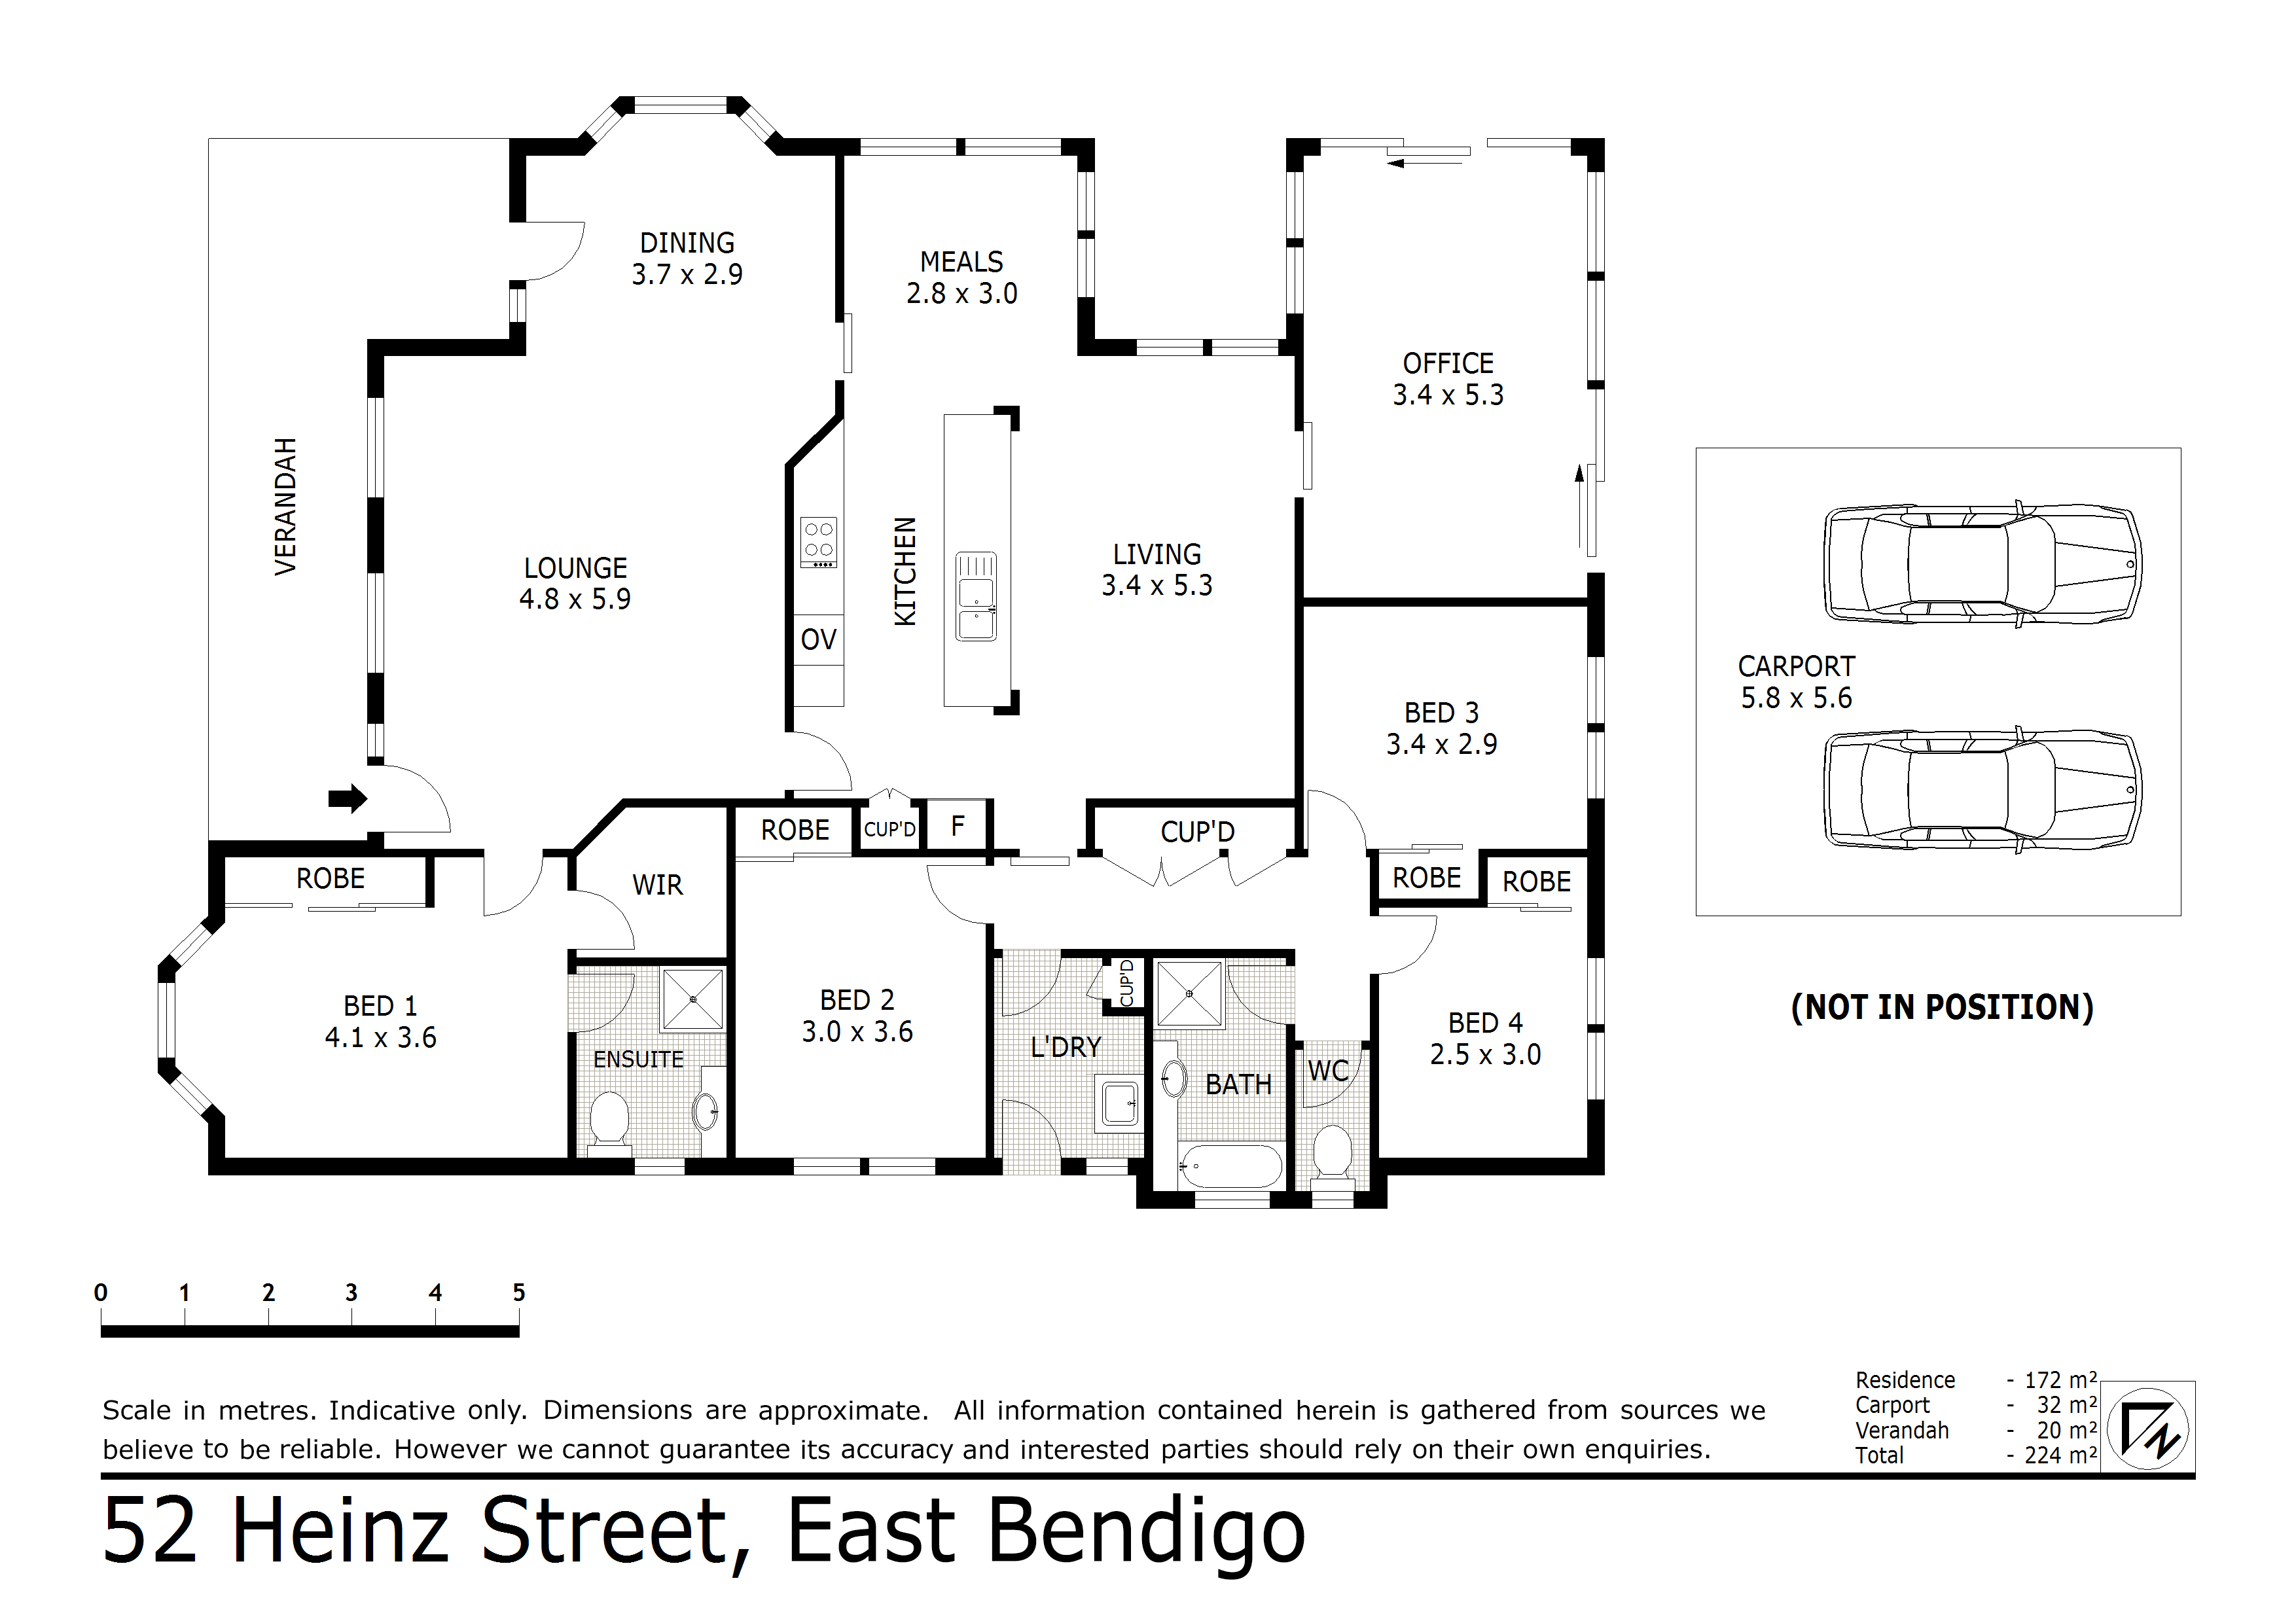 52 Heinz Street, East Bendigo, VIC 3550